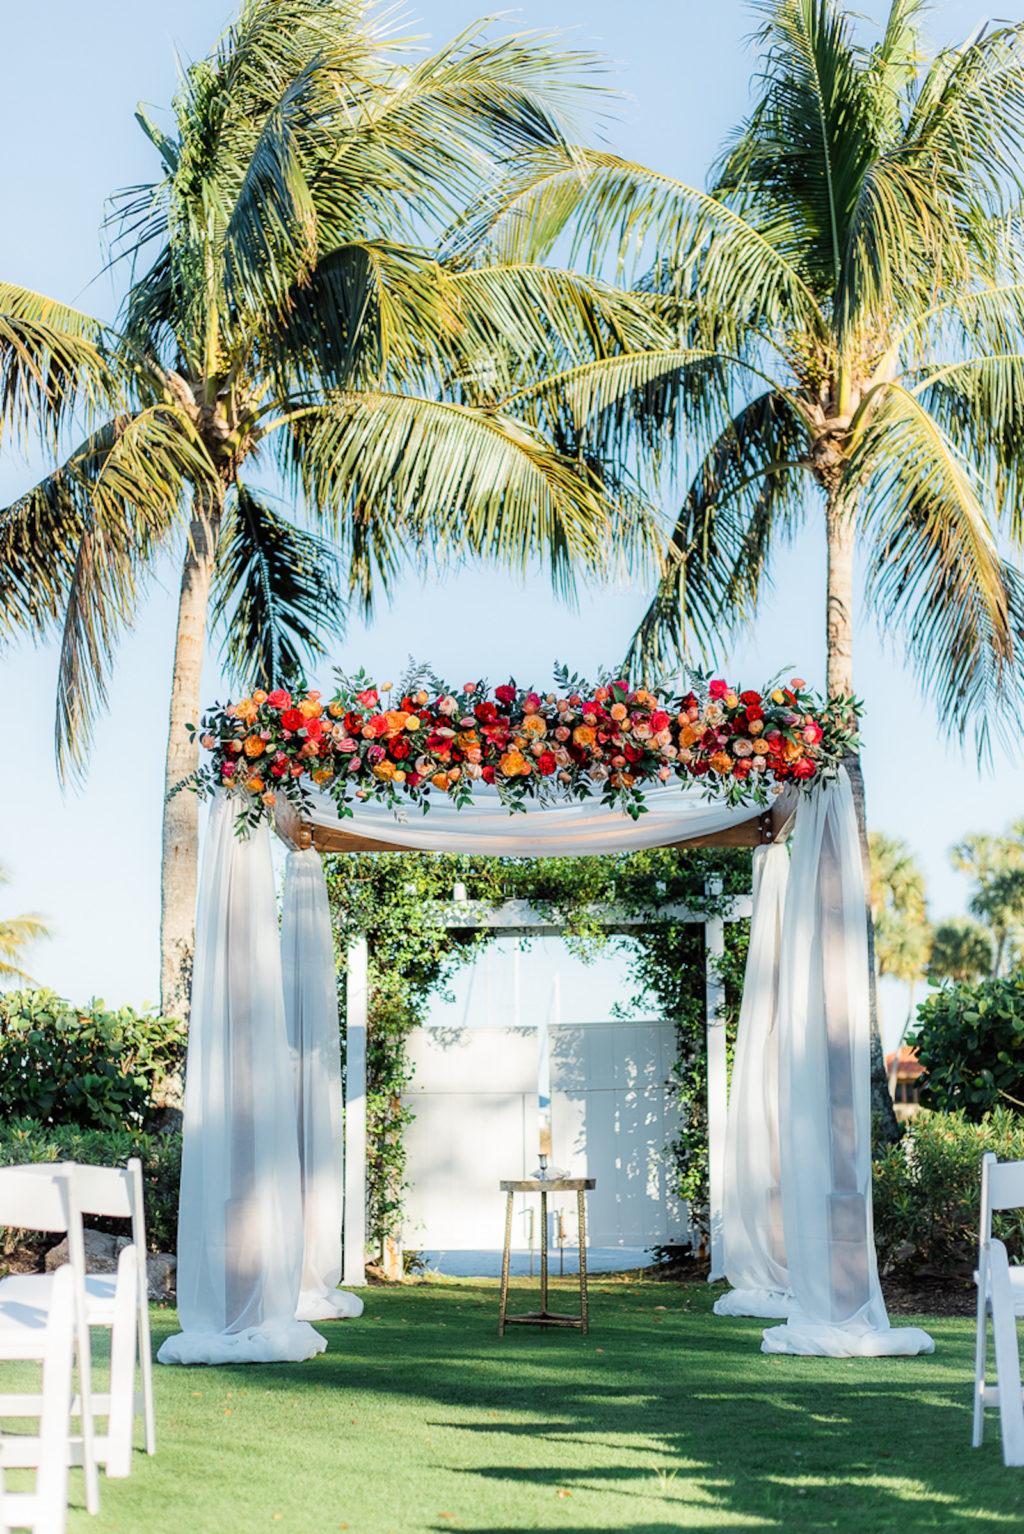 Elegant Wedding Ceremony Decor, Arch with White Linens Jewel Tone Orange, Pink, Red, Purple Roses, Greenery Floral Arrangements